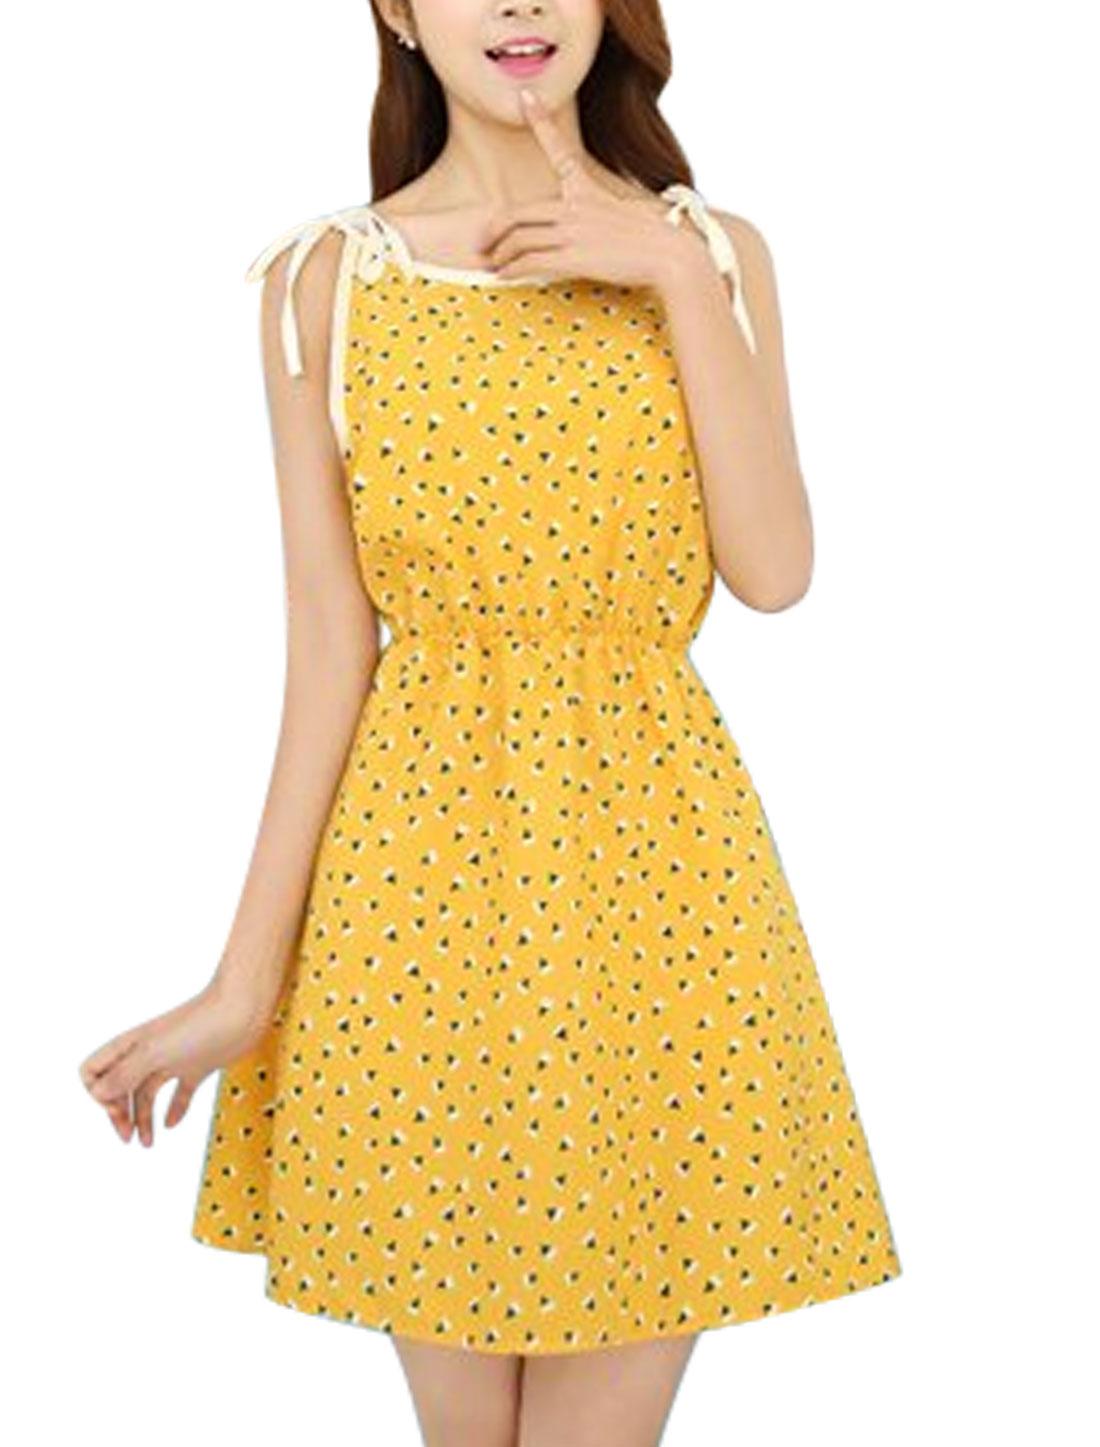 Women Self Tie Straps Sleeveless Geometric Prints A-Line Dress Yellow XS